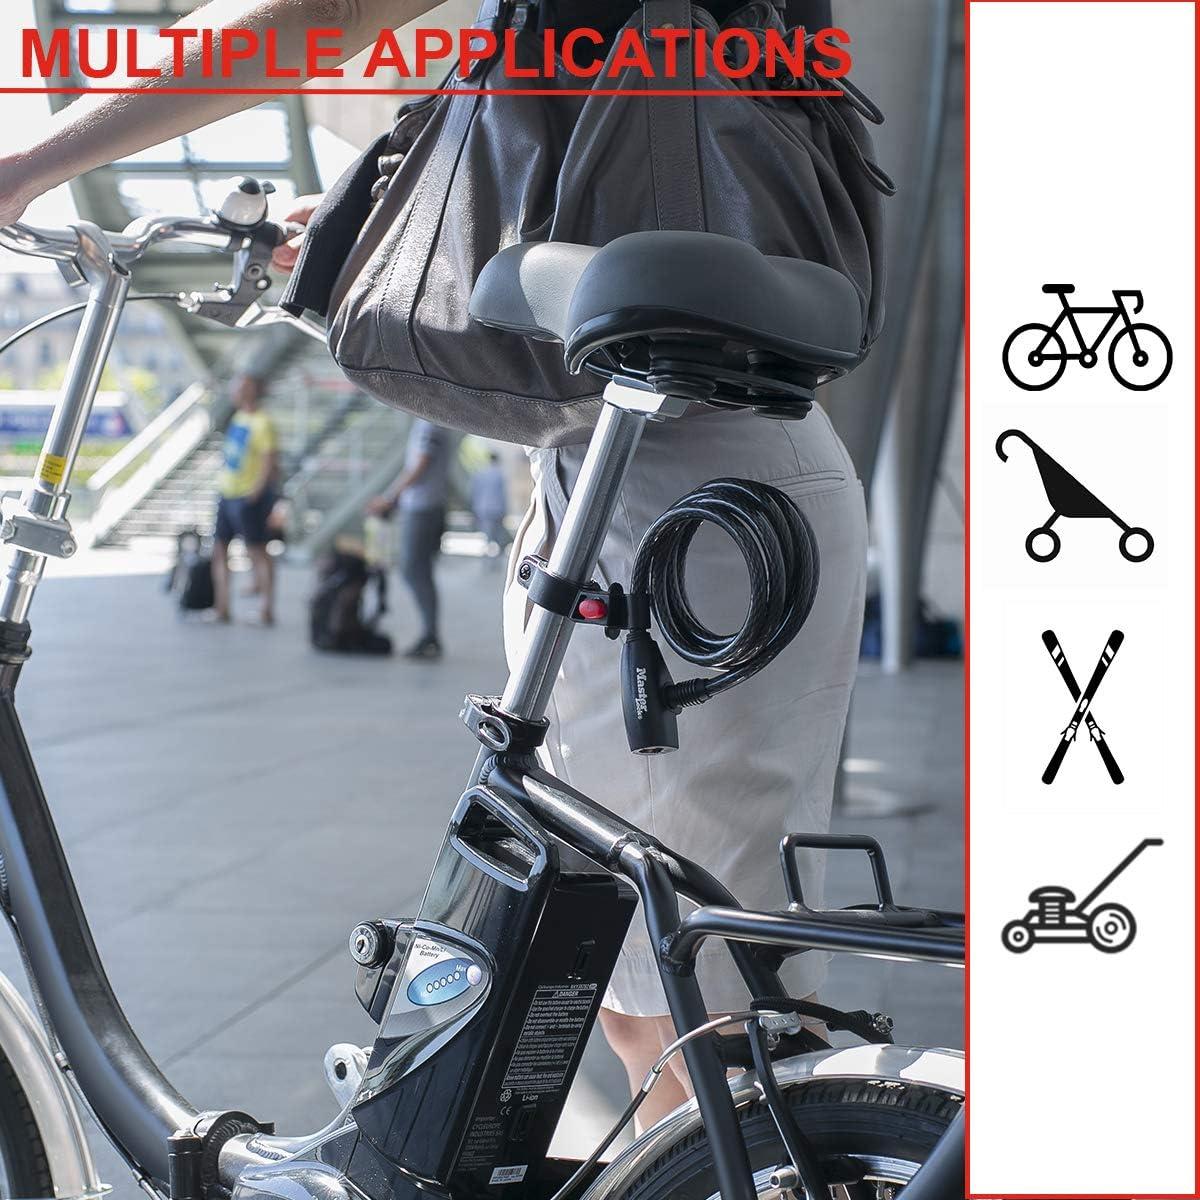 Llave 1,8 m Cable Cortac/ésped y Otro Equipo Monopat/ín Paseante Flexible Montaje Exterior 8232EURDPRO Ideal para Bicicleta MASTER LOCK Candado Bicicleta